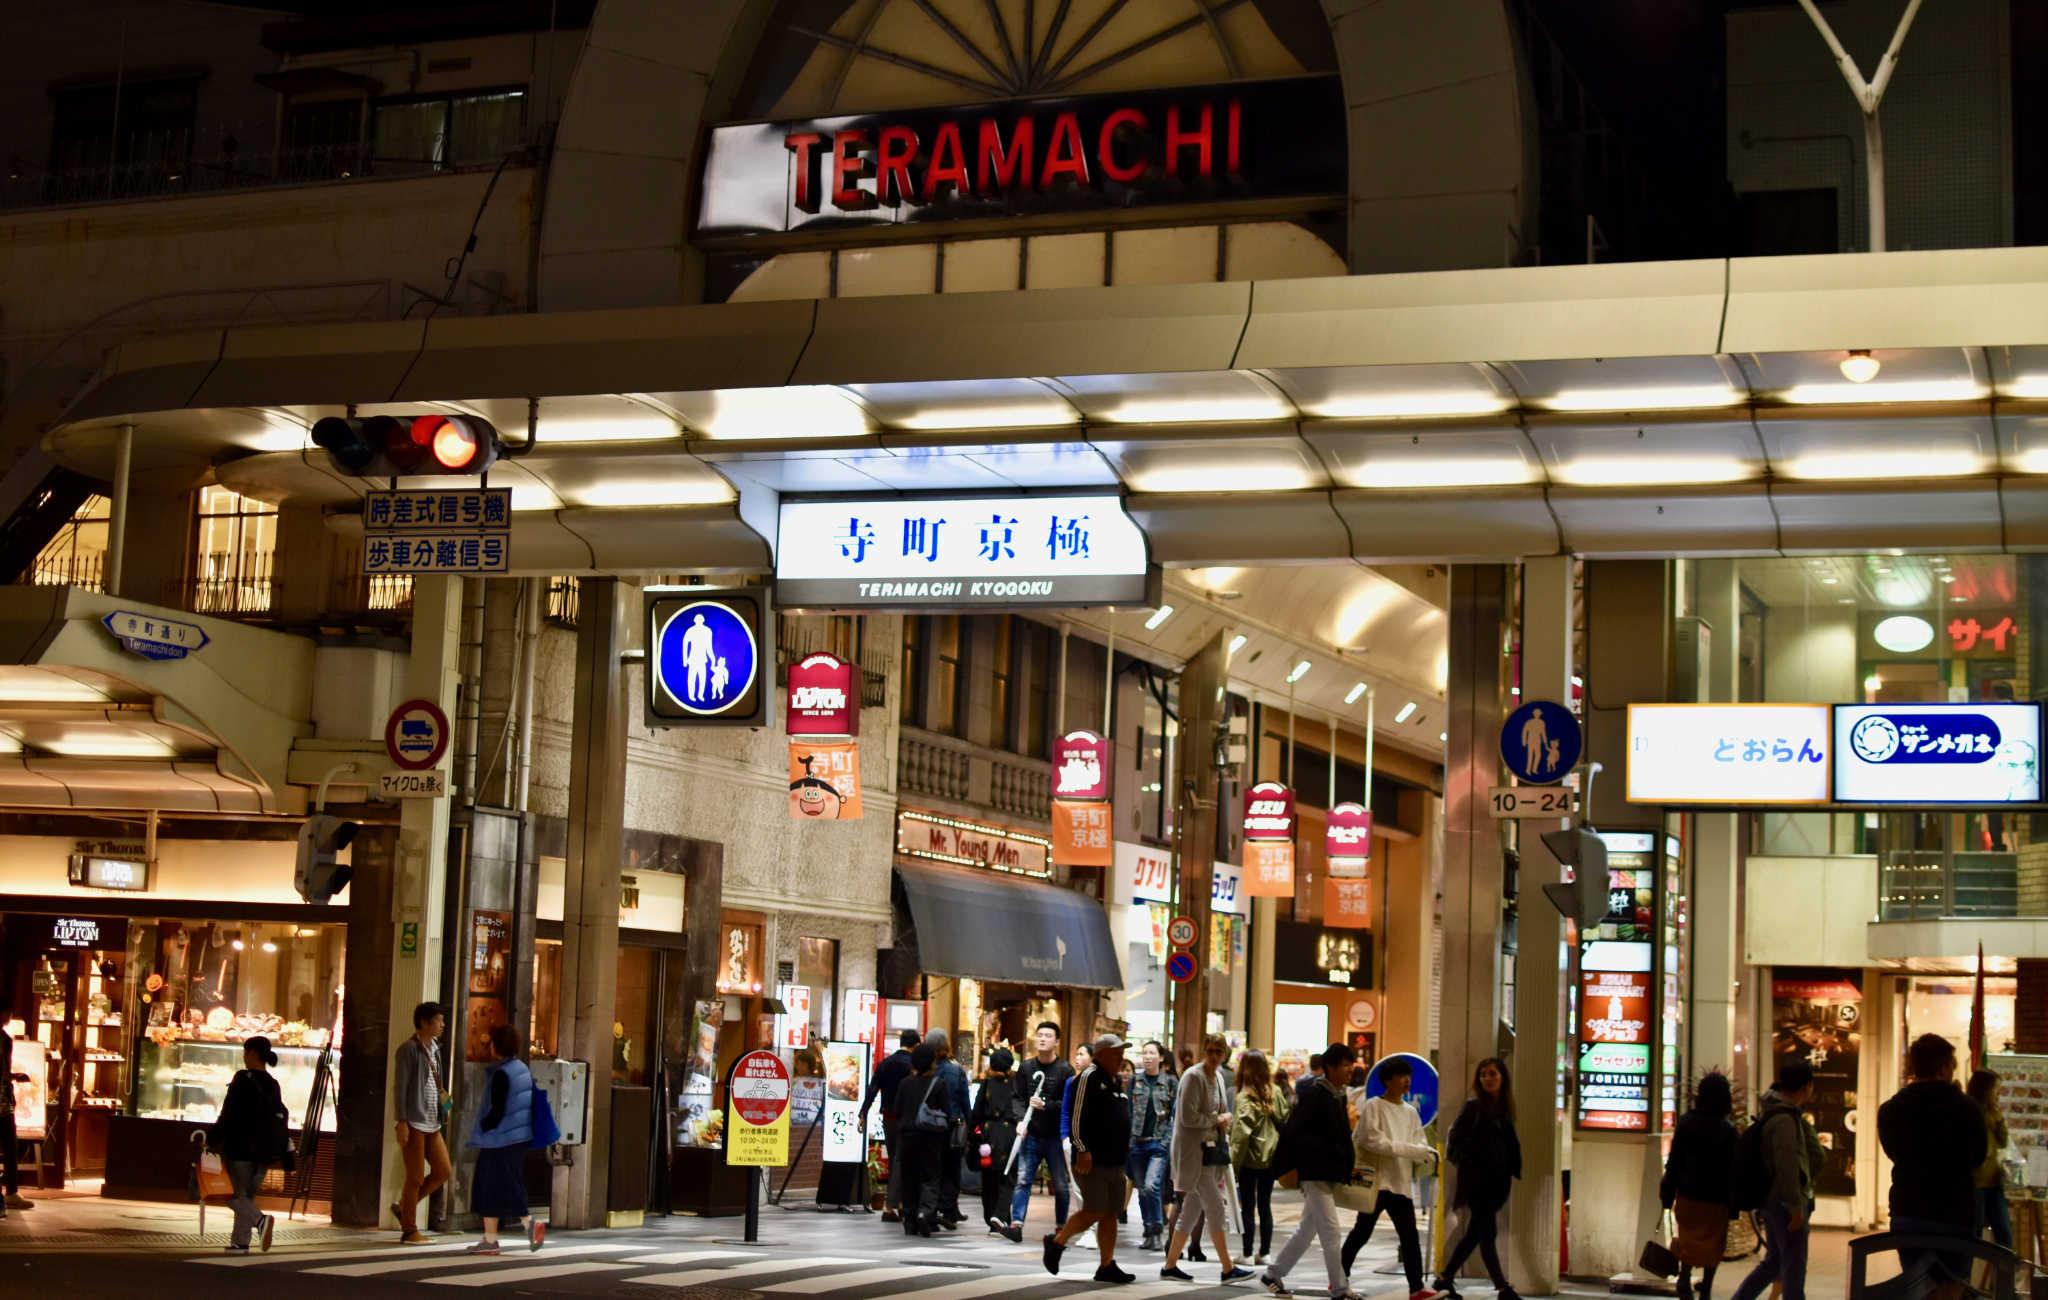 L'engrée de l'arcade commerçante de Teramachi, depuis la Shijo-Dori